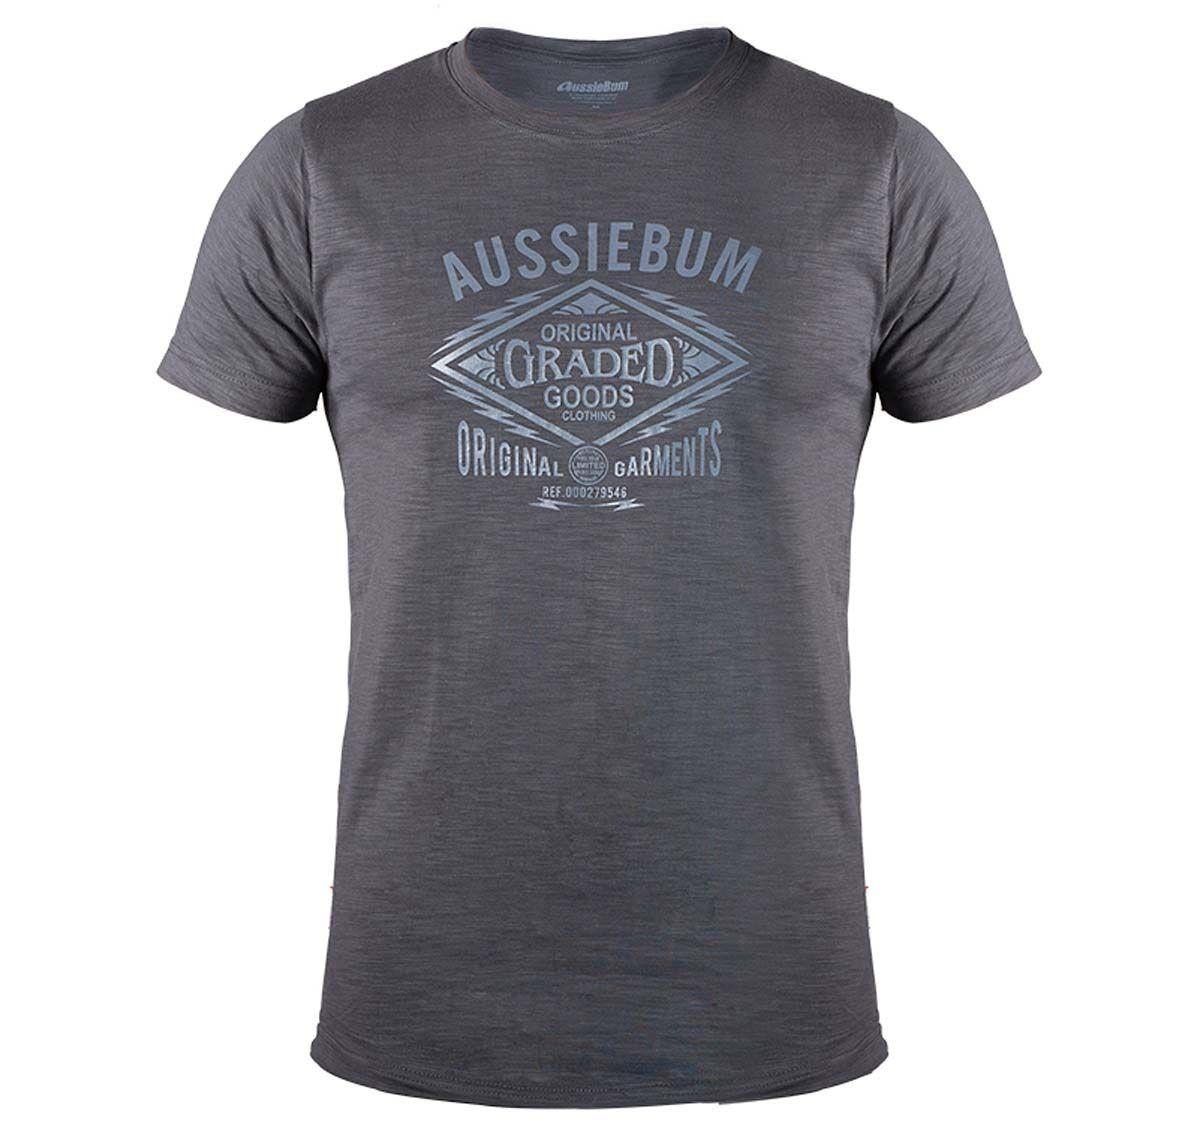 aussieBum T-Shirt DESIGNER TEE GOODS, grey